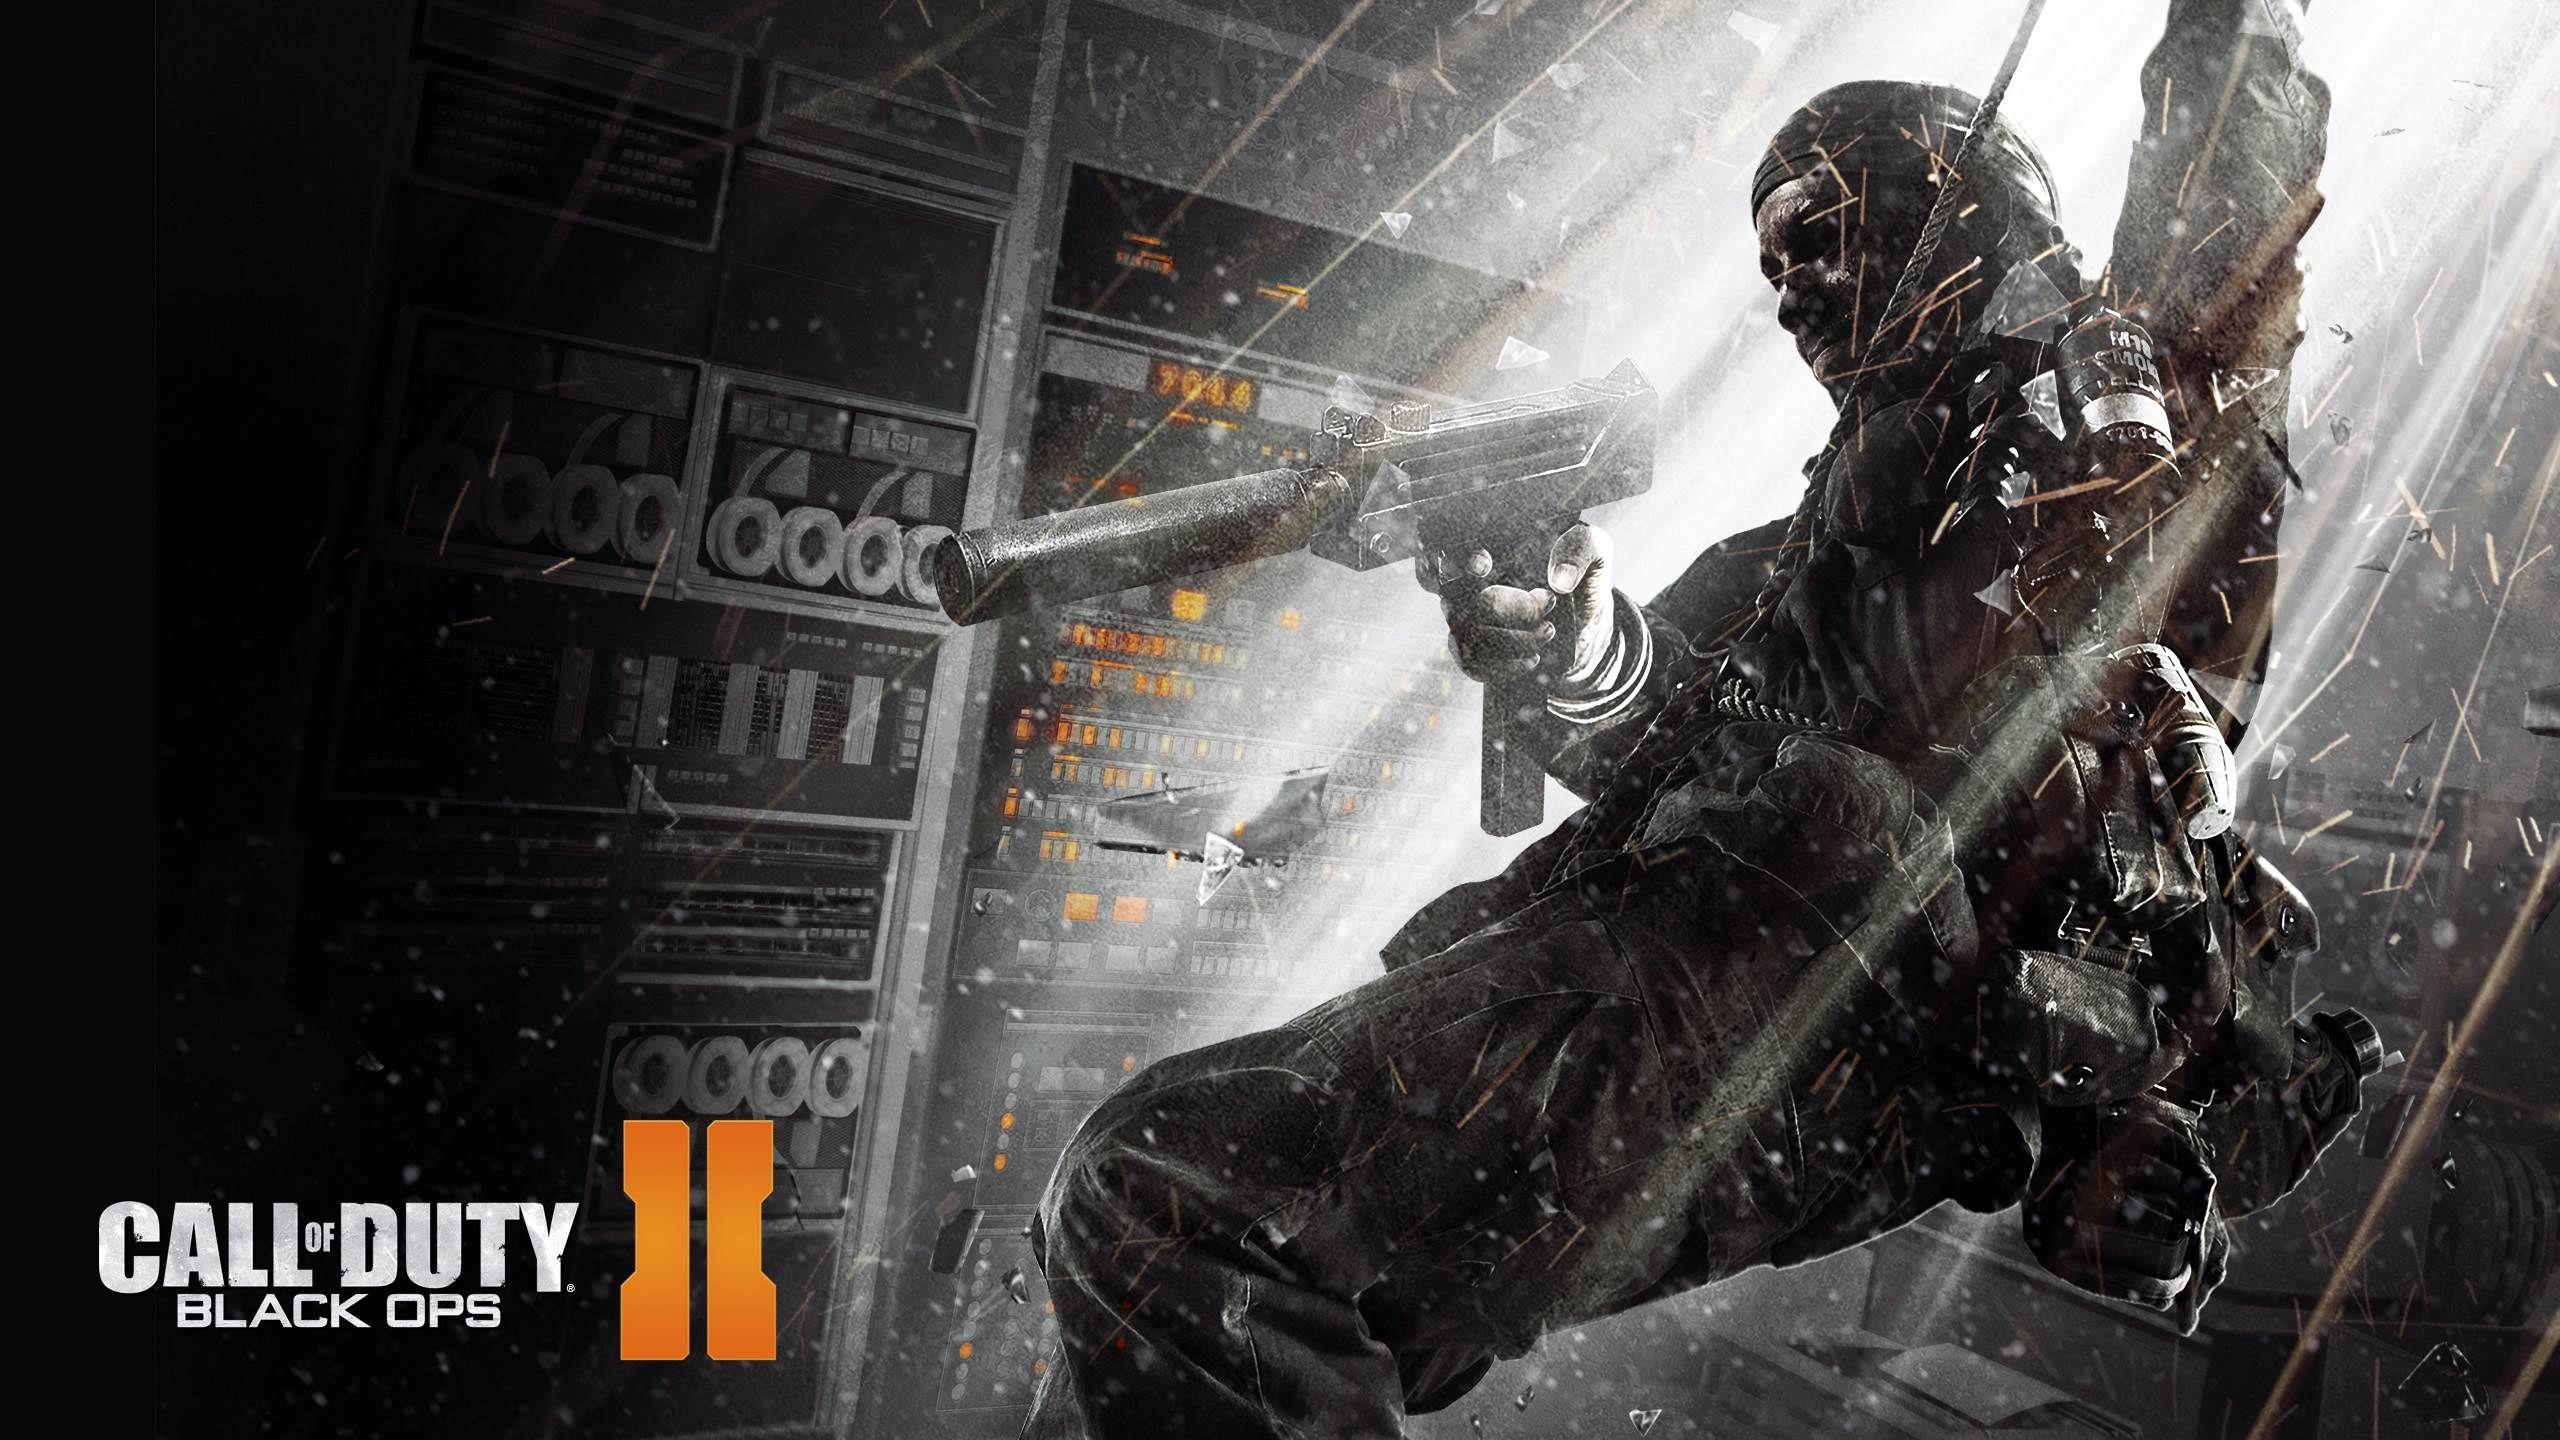 Call of Duty Black Ops II HD desktop wallpaper : Widescreen : High 2560×1440 Call Of Duty Wallpapers Black Ops 2   Adorable Wallpapers